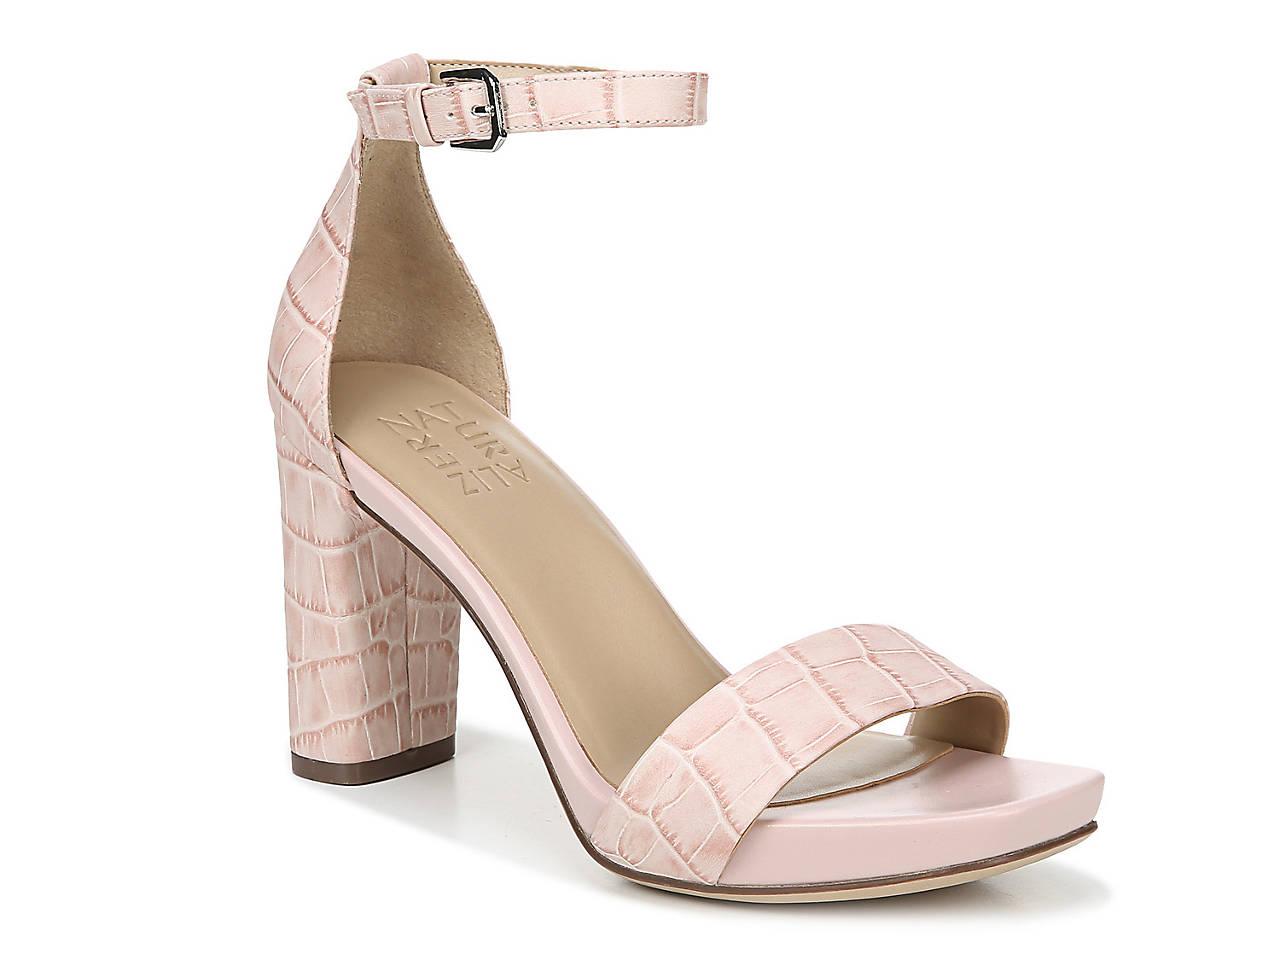 d31e8b3bf6 Naturalizer Joy Platform Sandal Women's Shoes | DSW